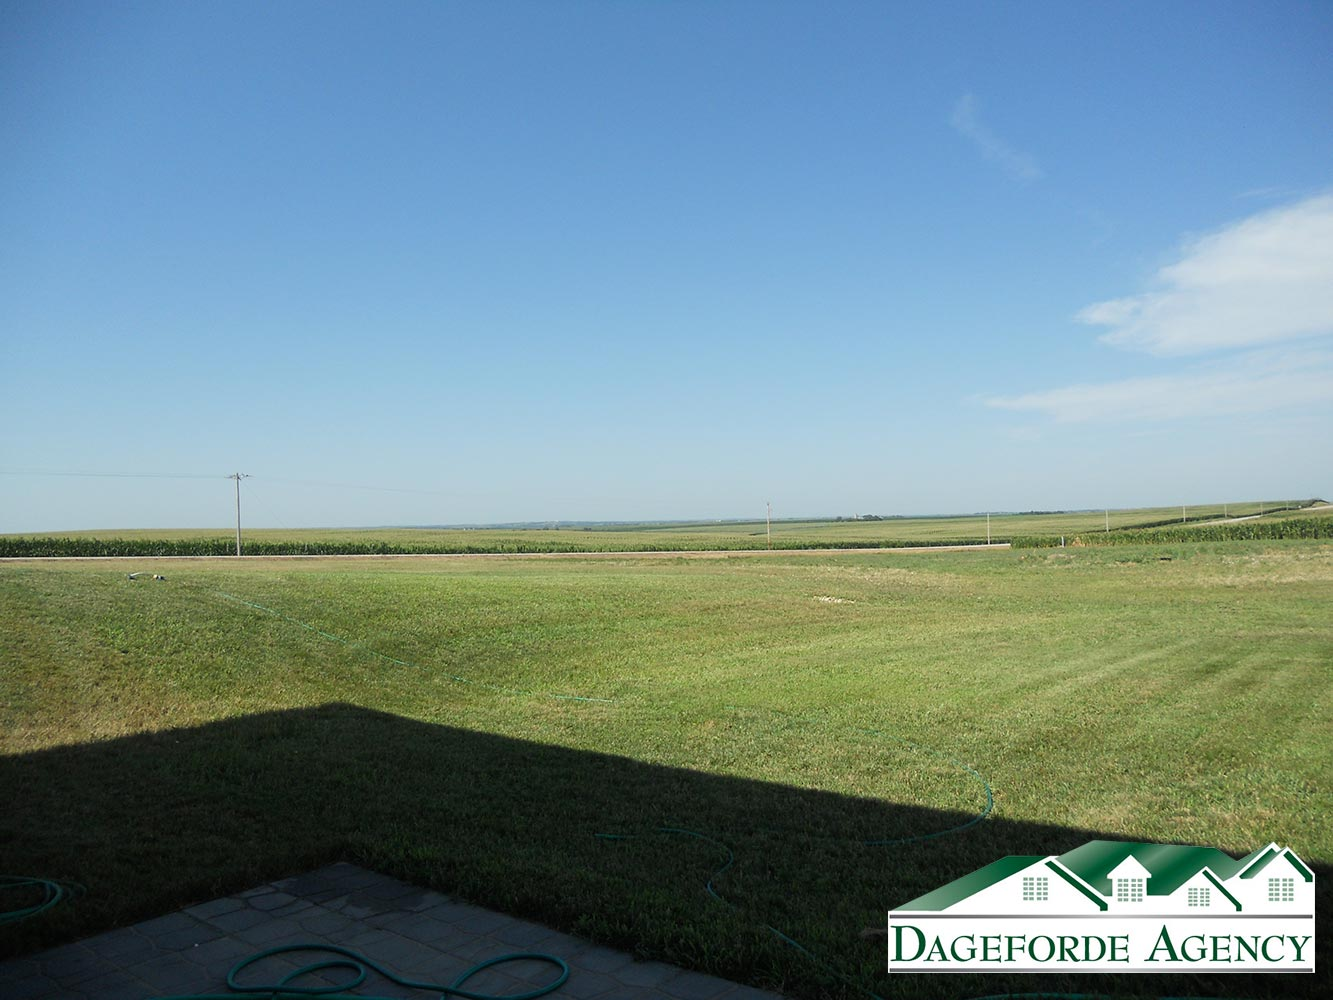 Roker---Landscape---Southwest-View